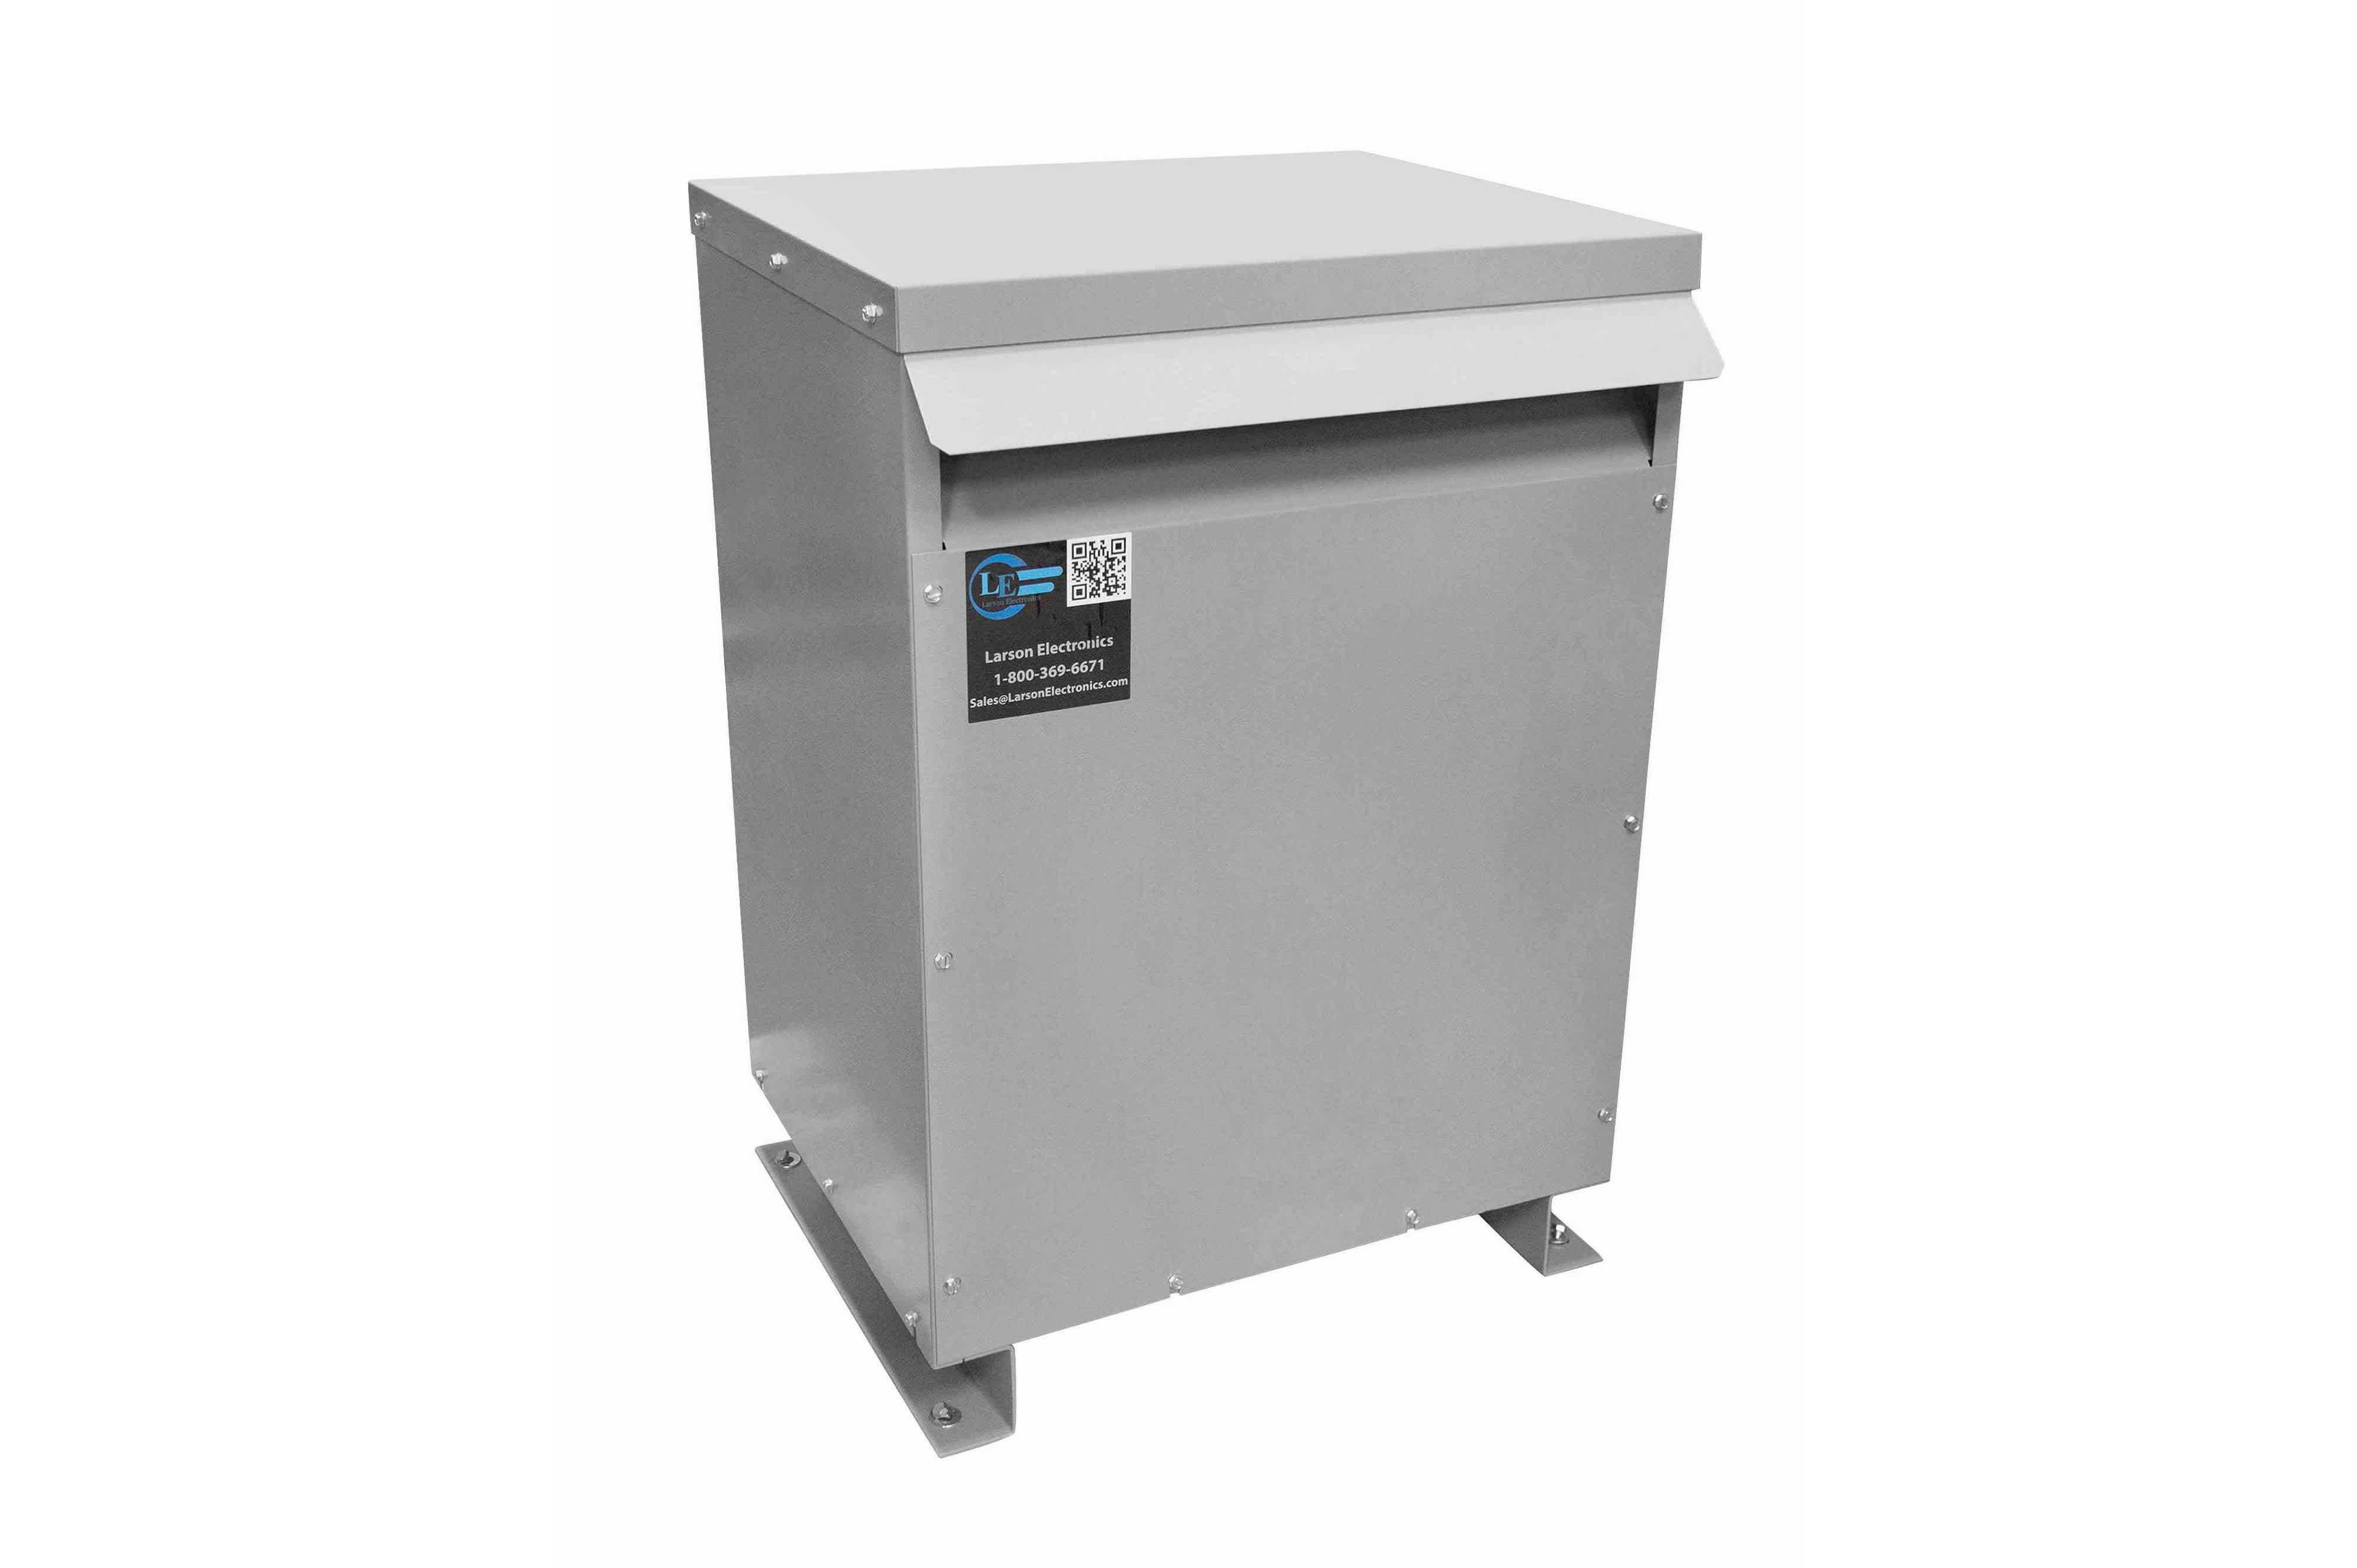 60 kVA 3PH Isolation Transformer, 208V Wye Primary, 380Y/220 Wye-N Secondary, N3R, Ventilated, 60 Hz